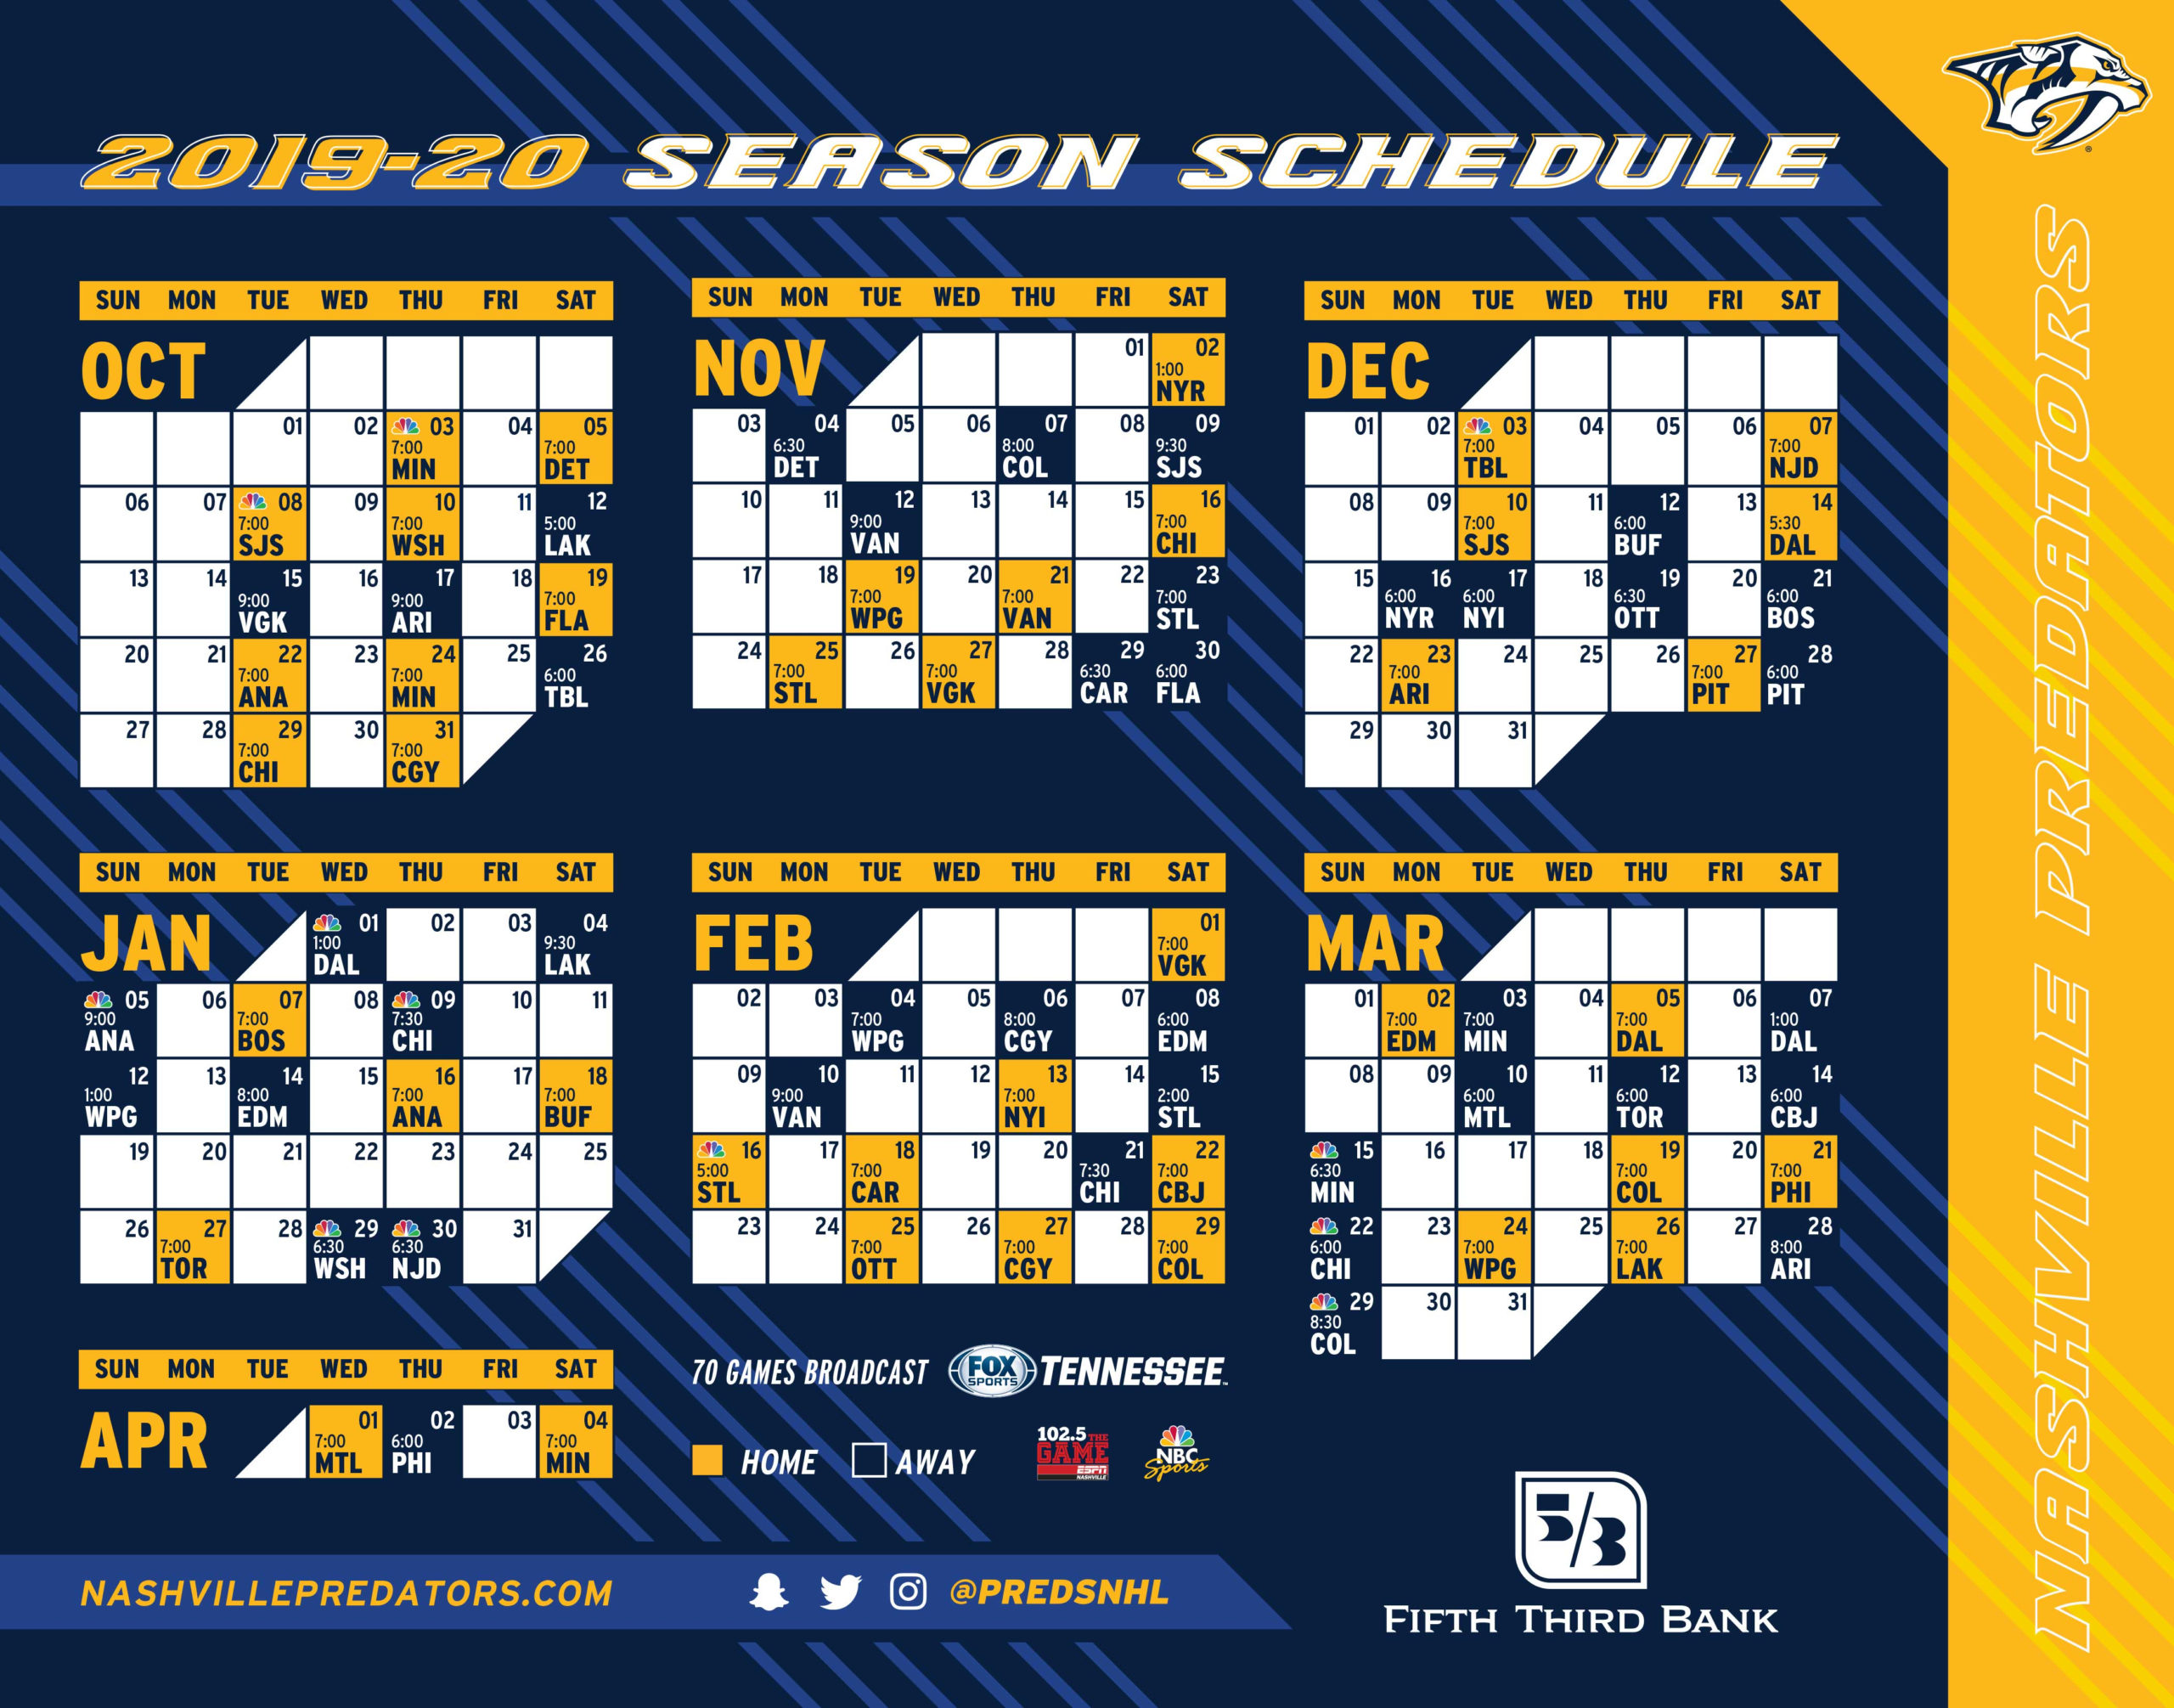 High Rez JPG Calendar Of The Nashville Predators 2019